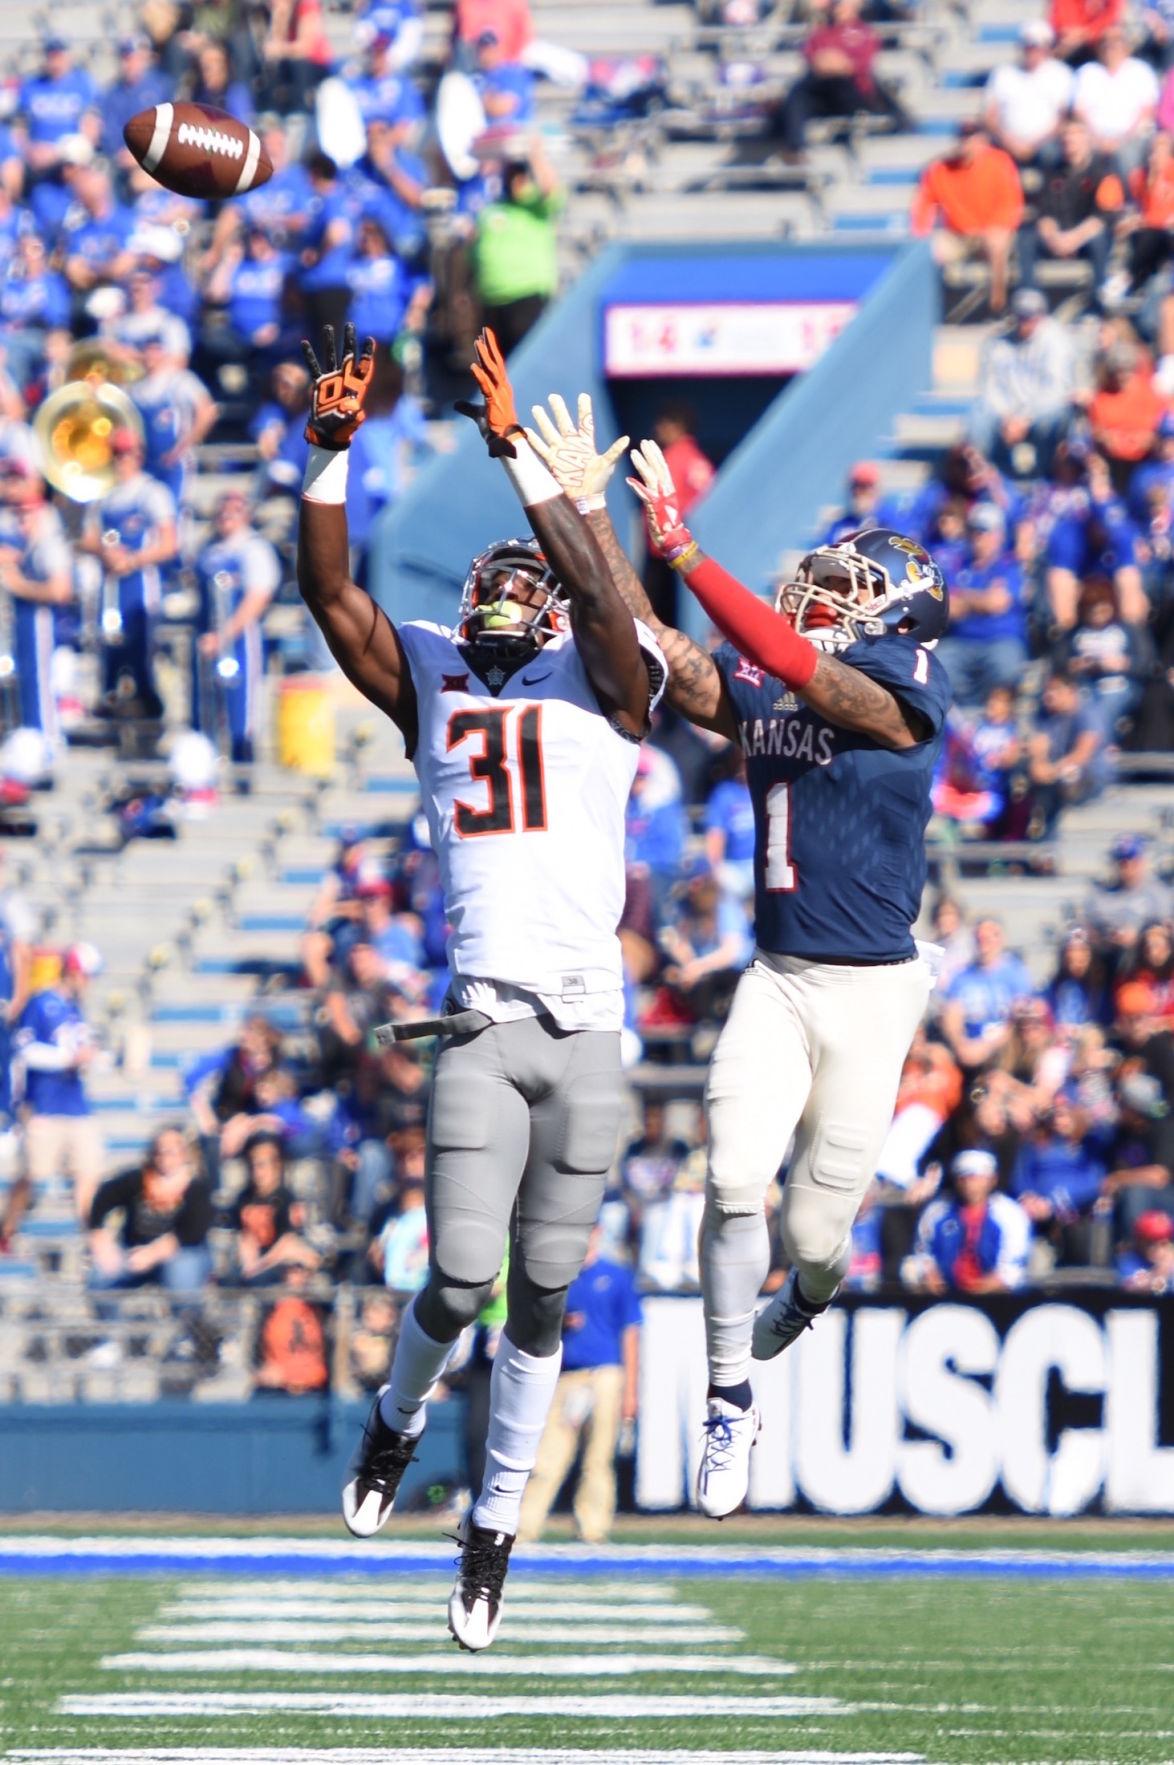 PHOTO GALLERY Oklahoma State football defeats Kansas Sports